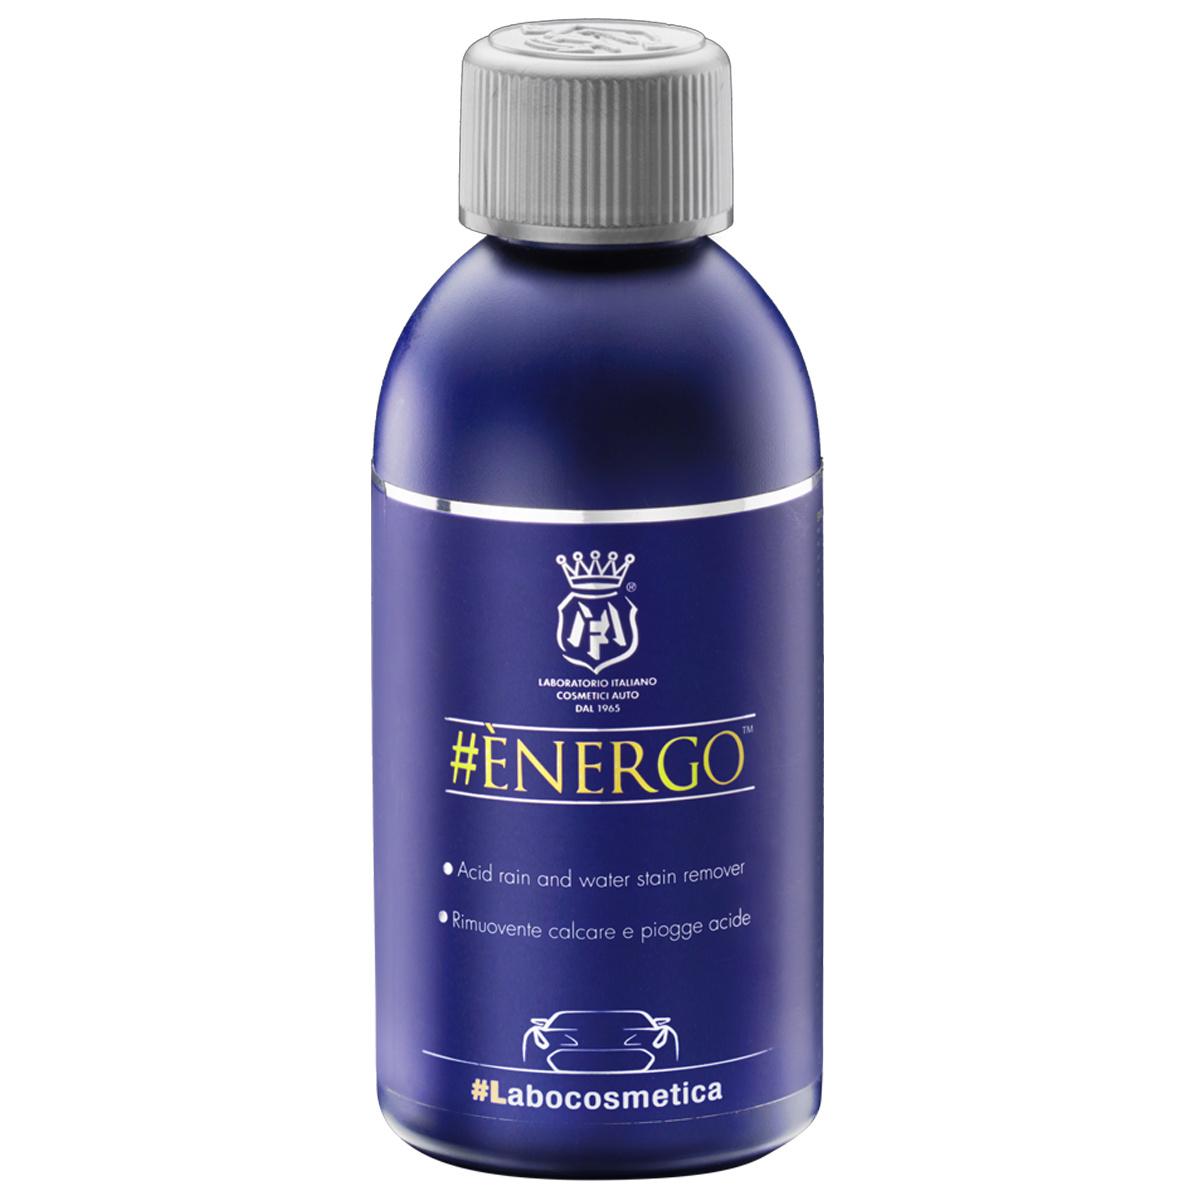 Labocosmetica  #ÈNERGO Kalkflecken-Entferner